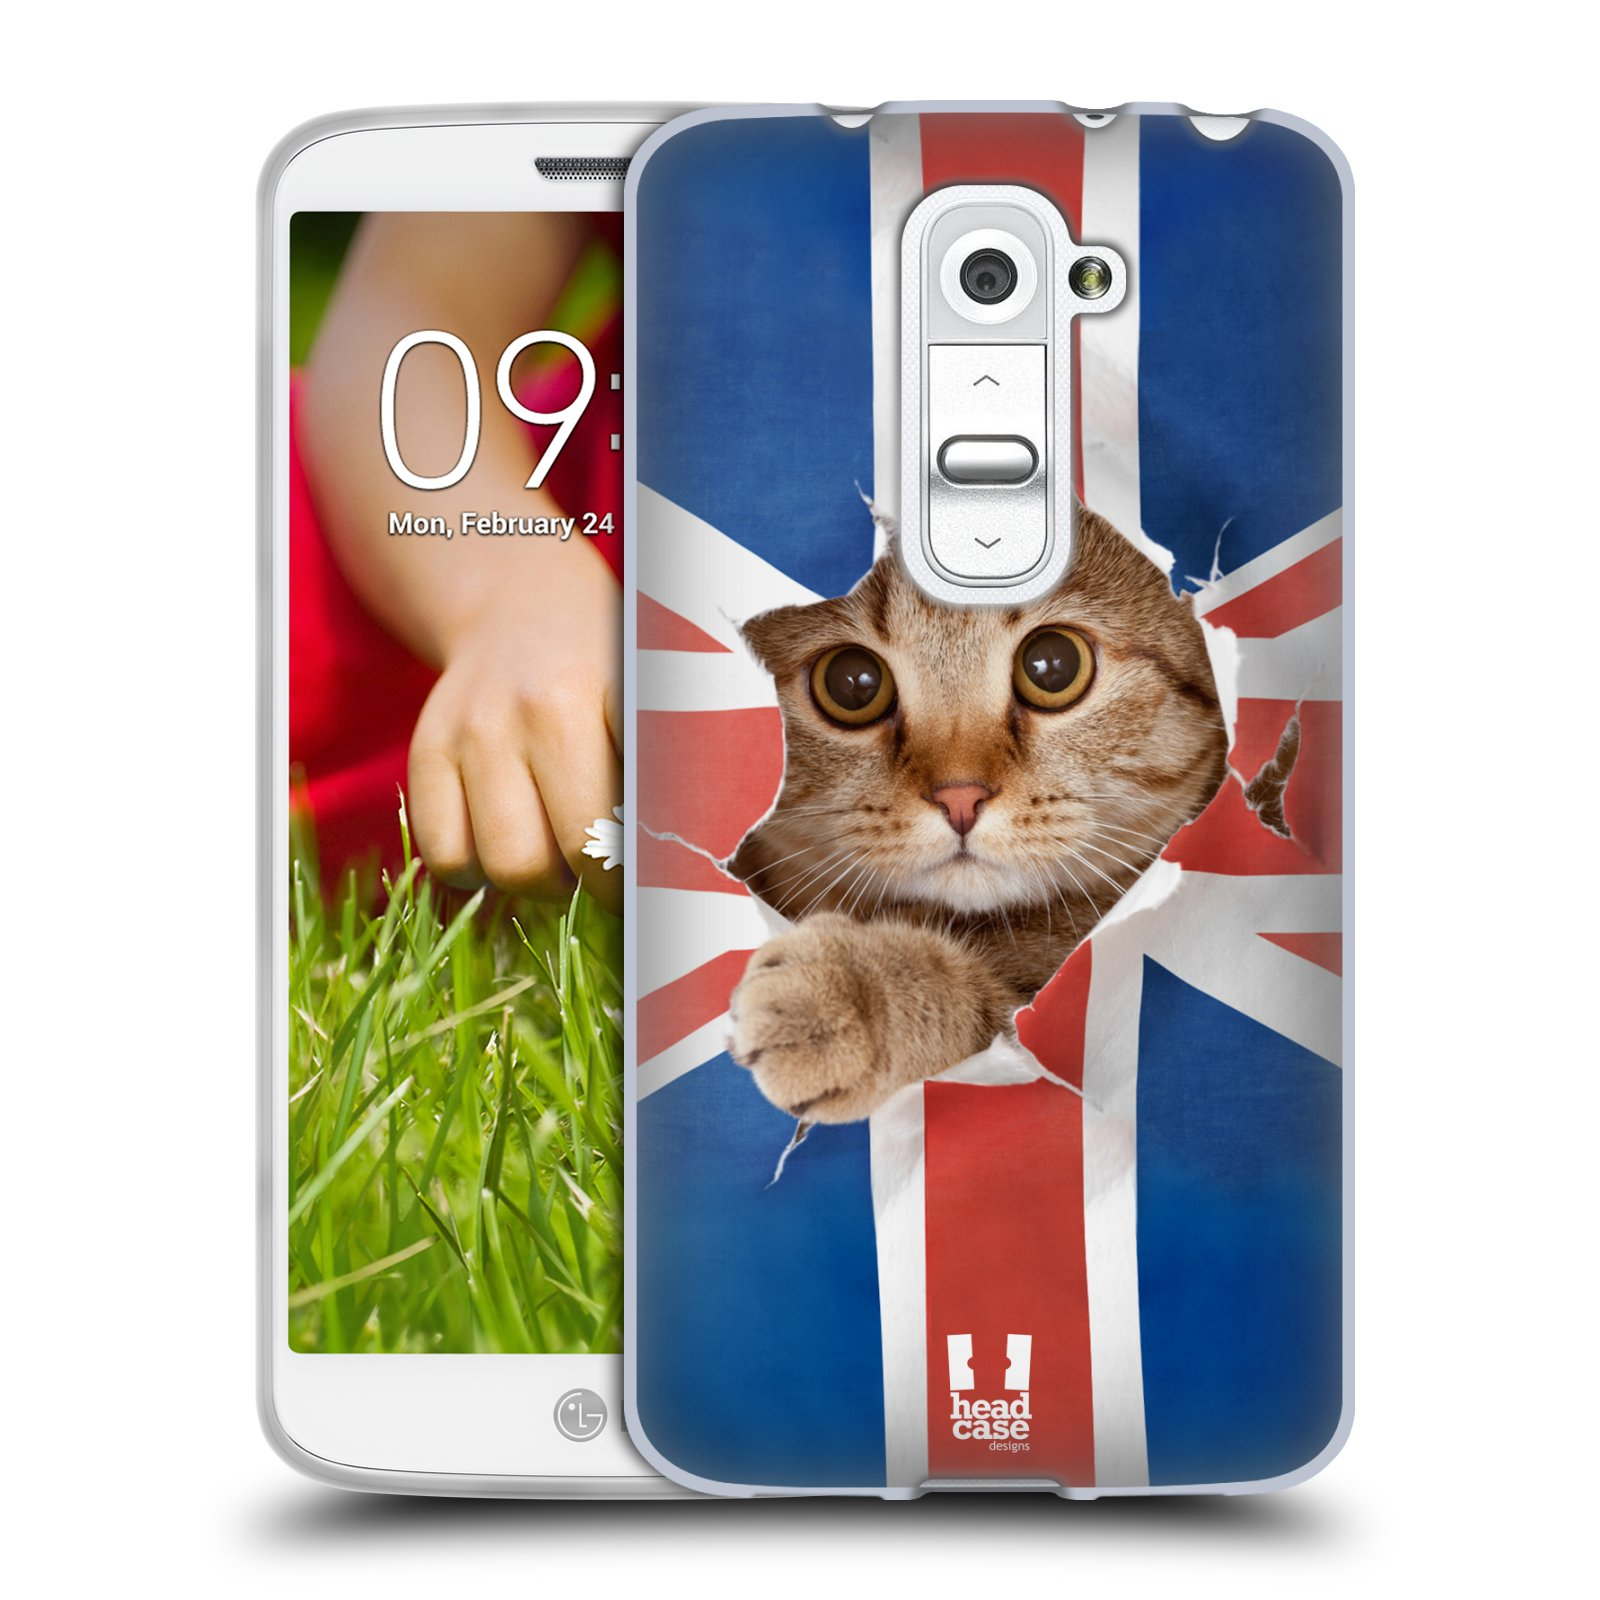 Silikonové pouzdro na mobil LG G2 Mini HEAD CASE KOČKA A VLAJKA (Silikonový kryt či obal na mobilní telefon LG G2 Mini D620)